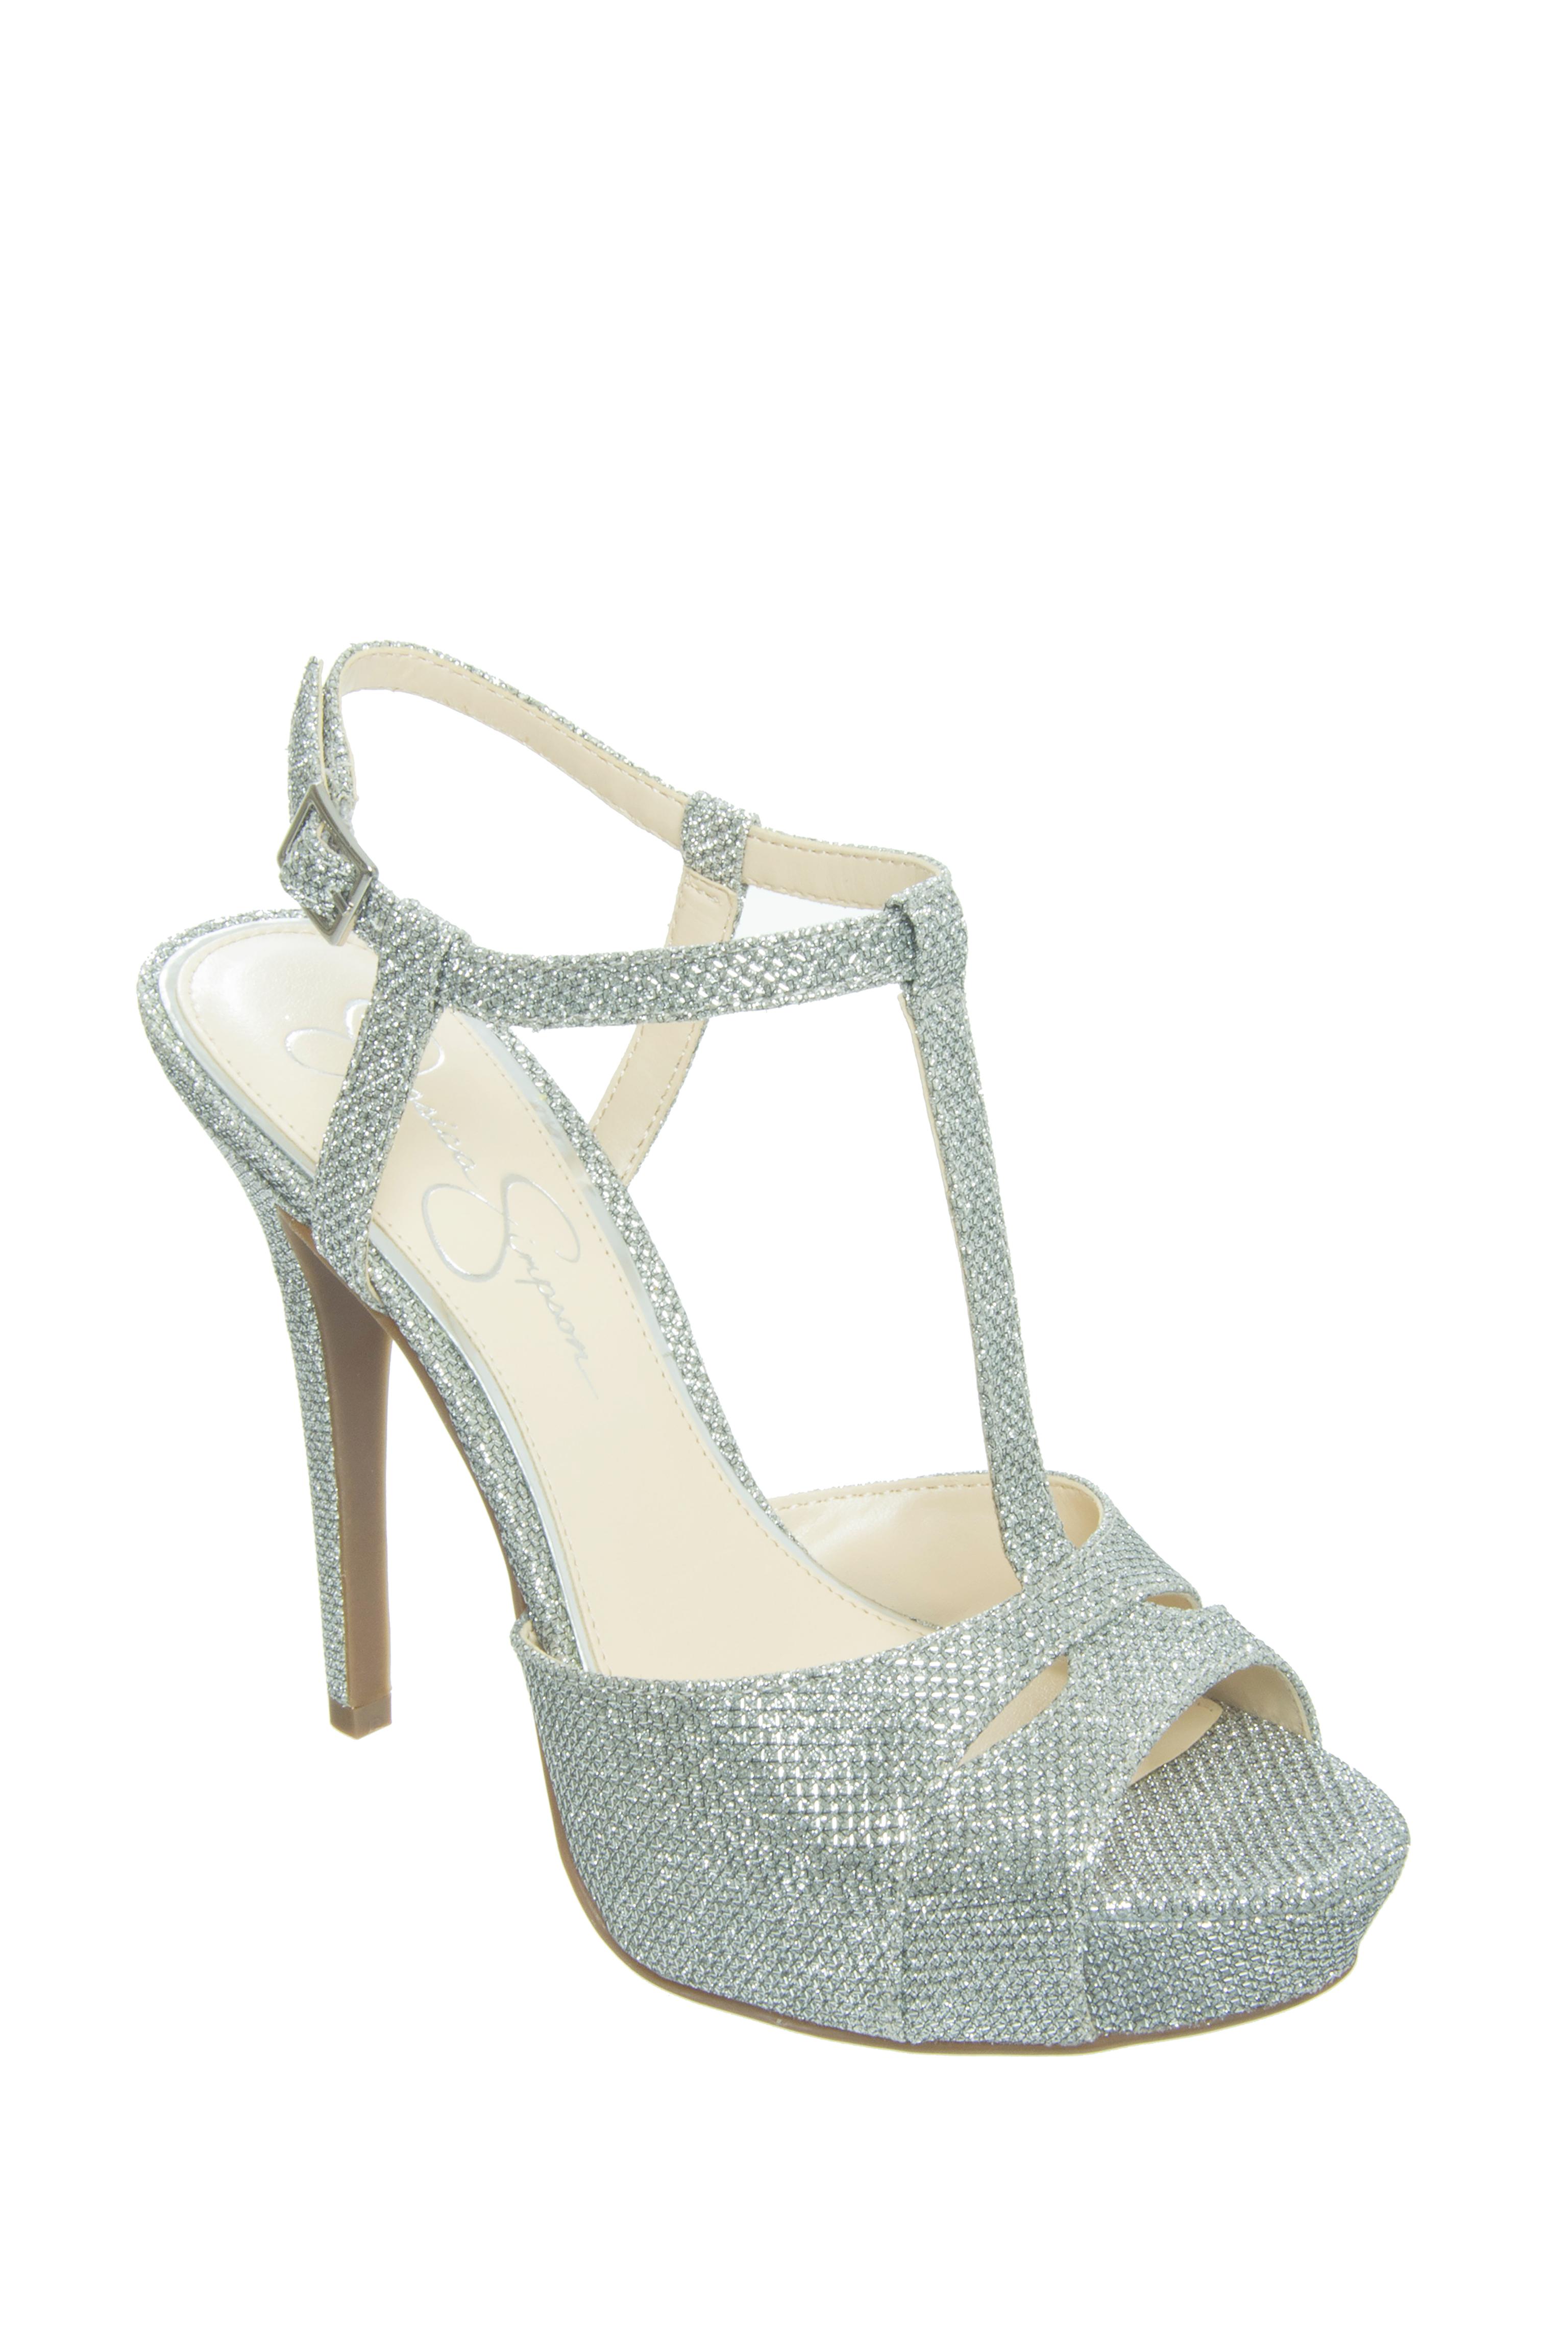 Jessica Simpson Barretta High Heel Sandals - Silver